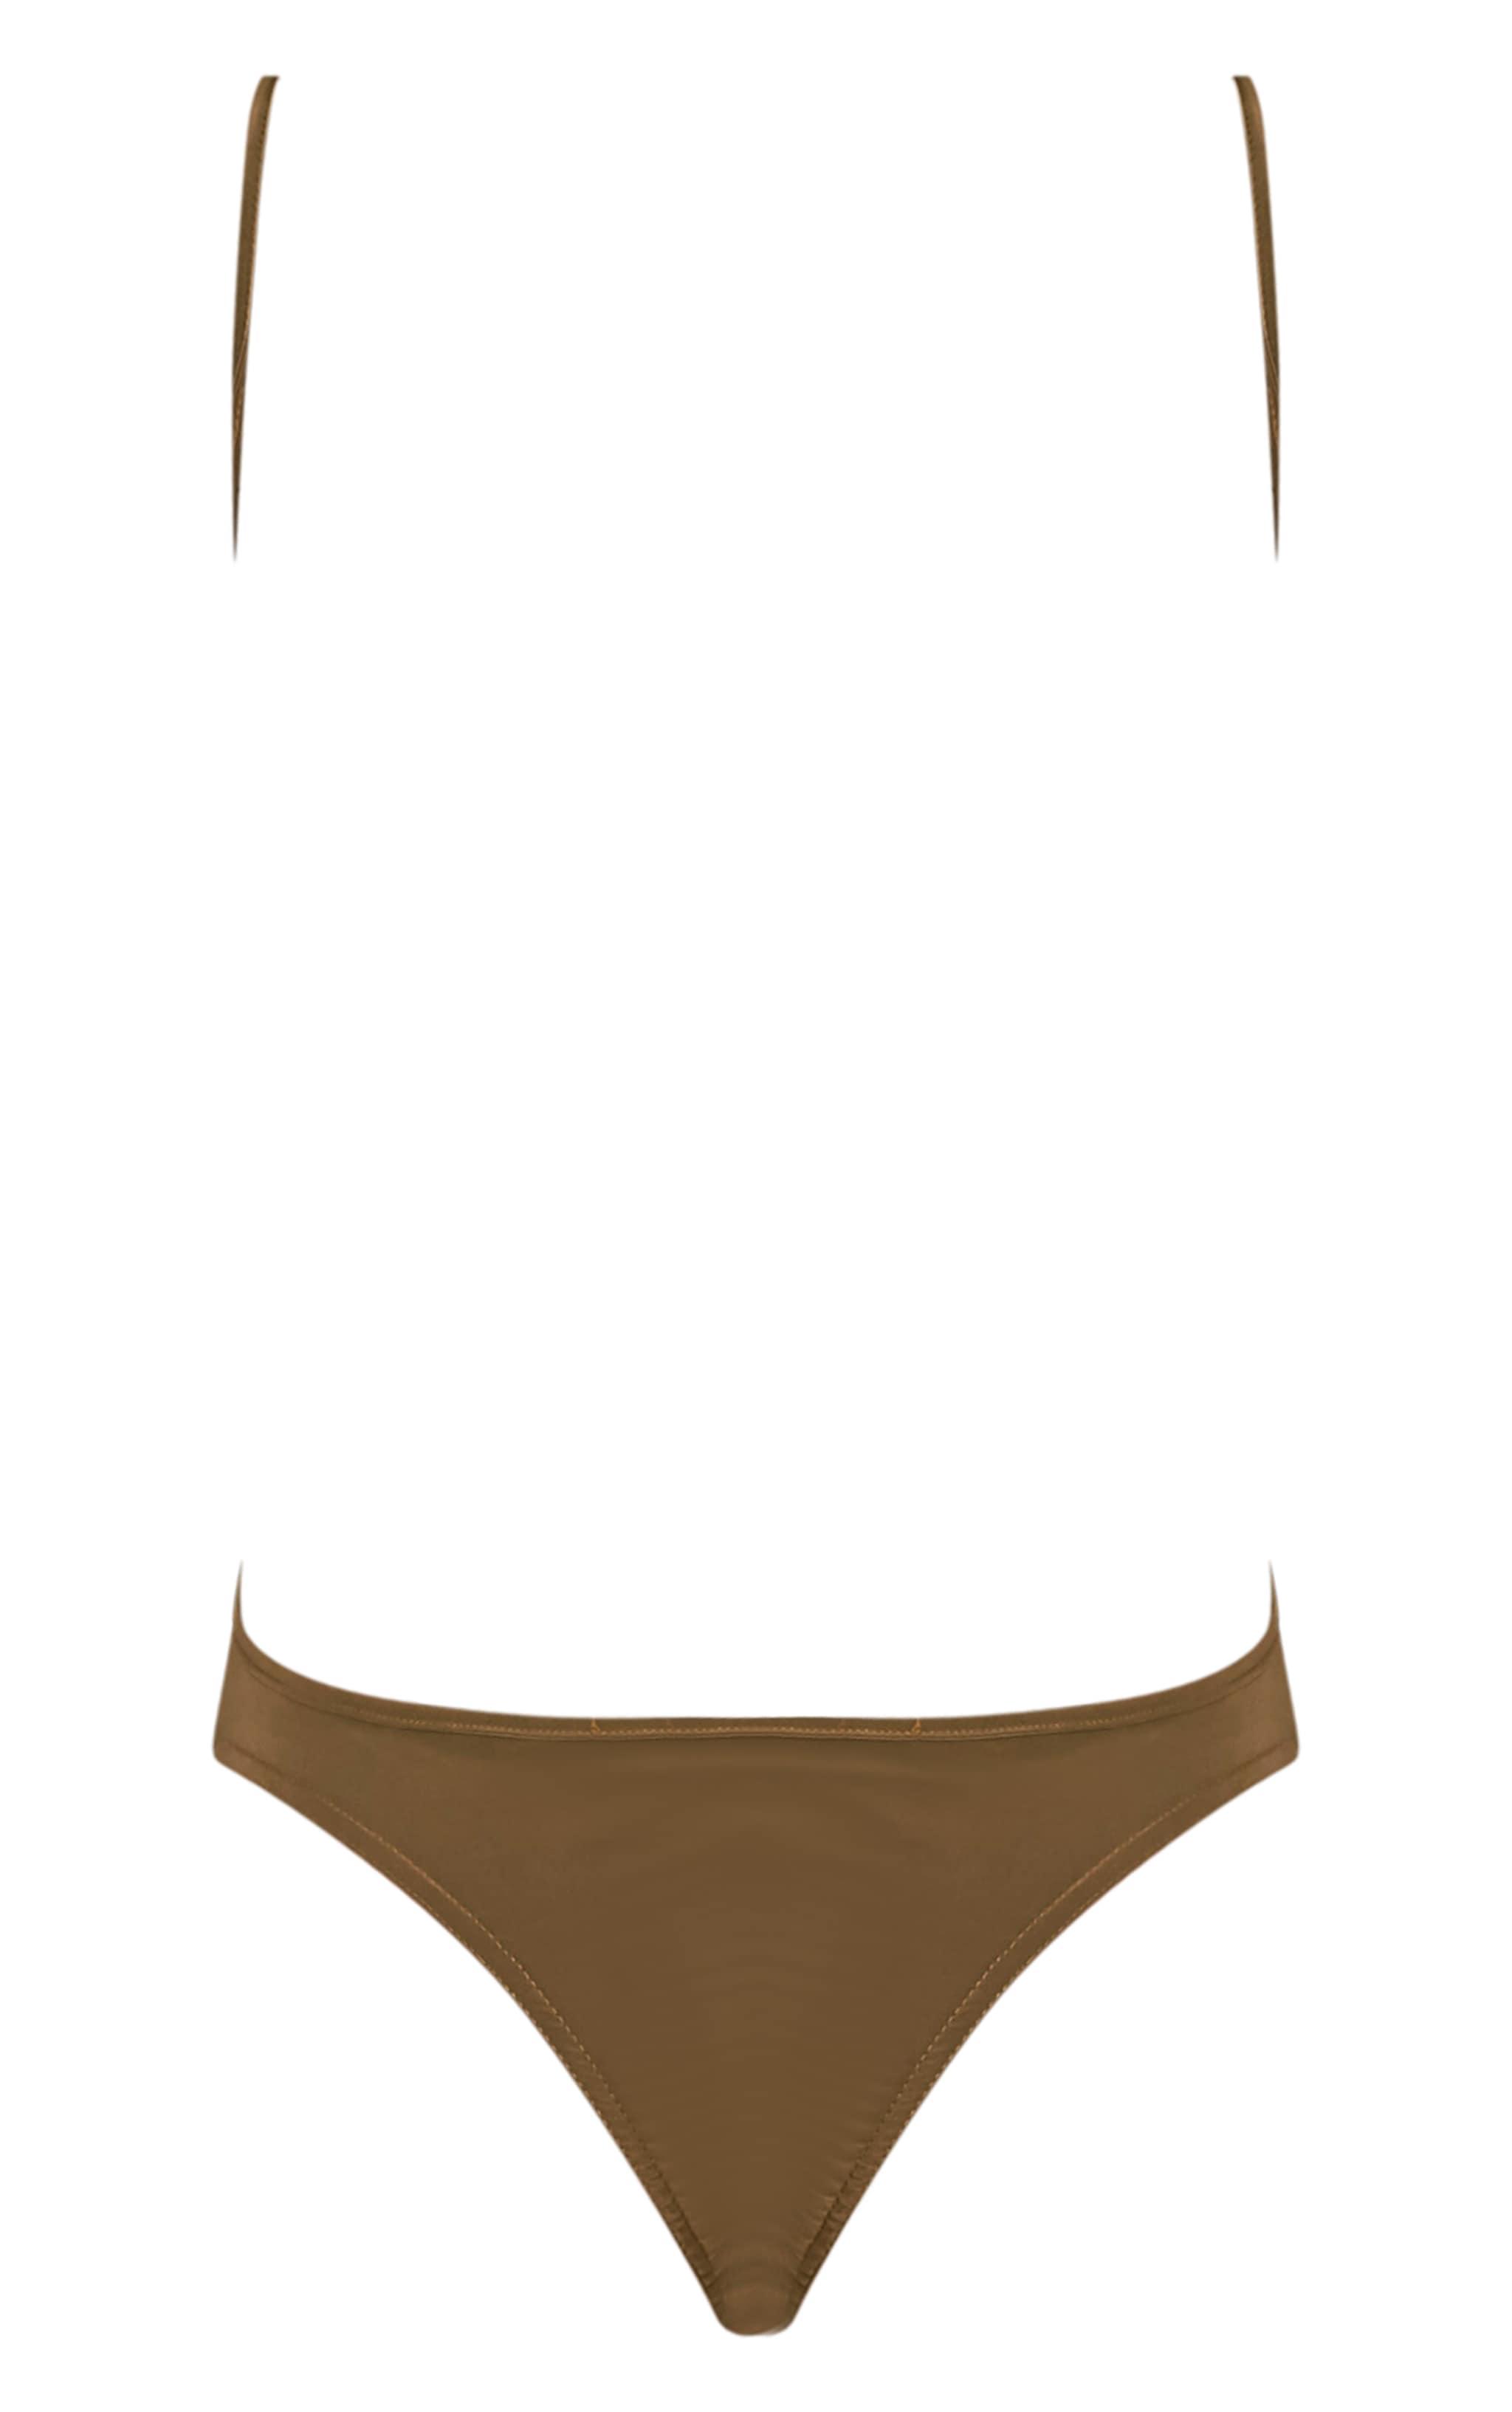 Devonna Khaki Backless Slinky Thong Bodysuit 4